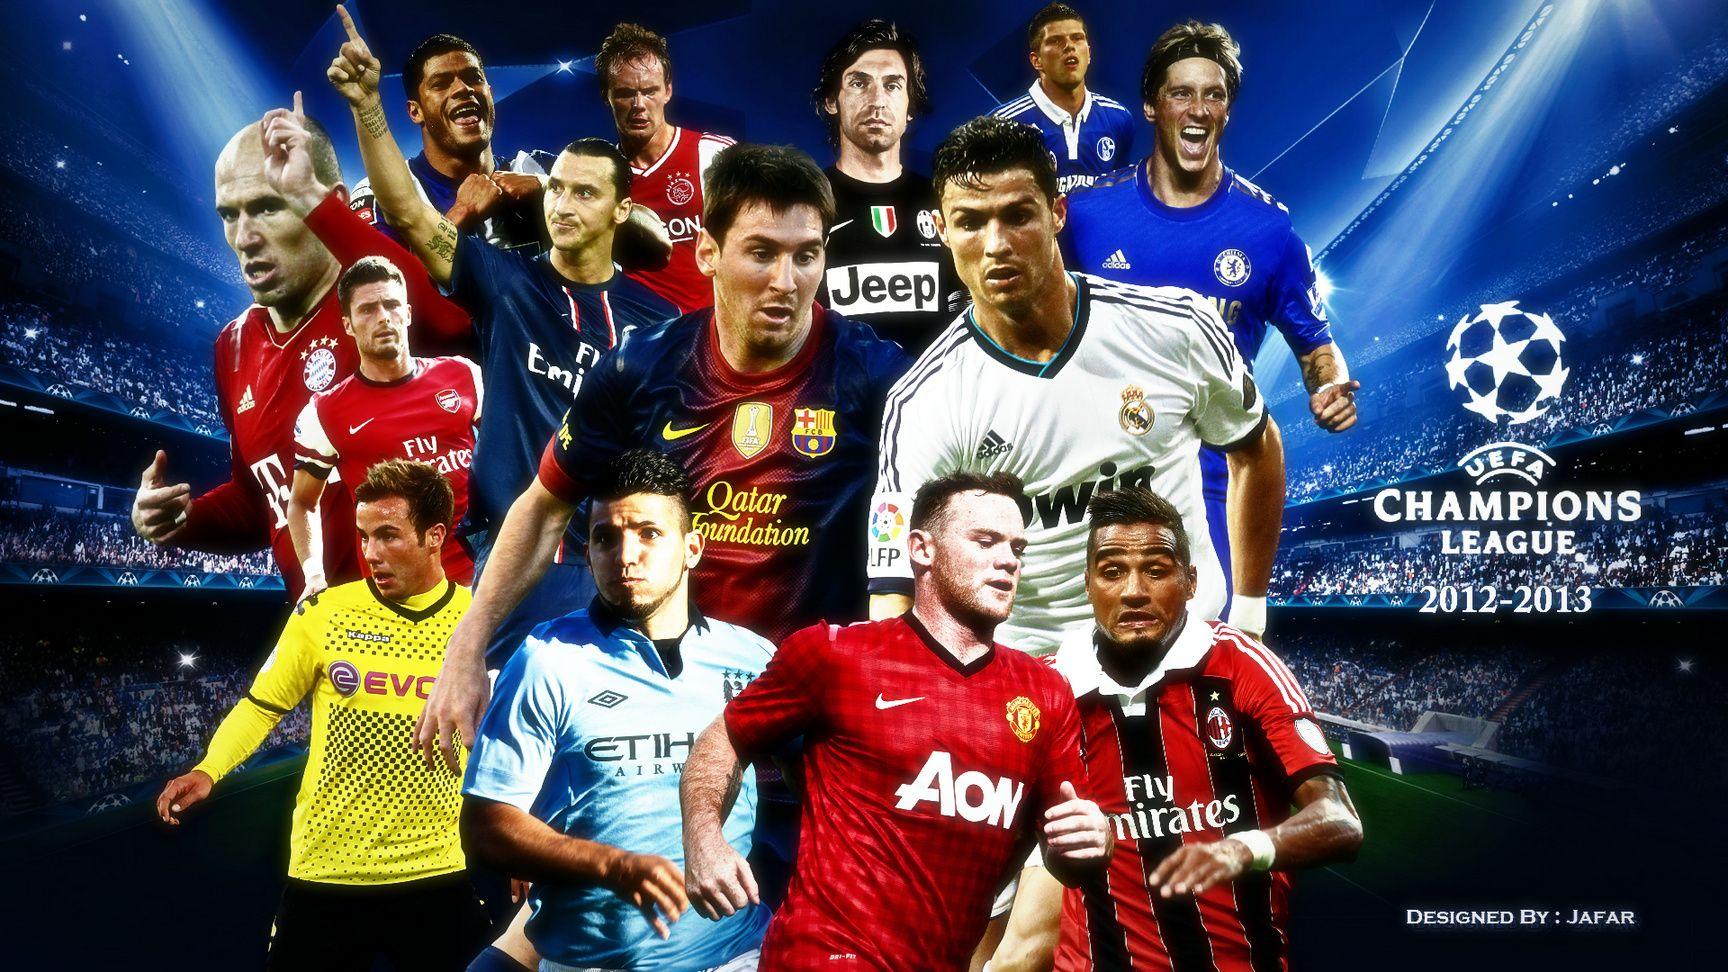 Uefa champions league uefa champions league pinterest uefa champions league voltagebd Images